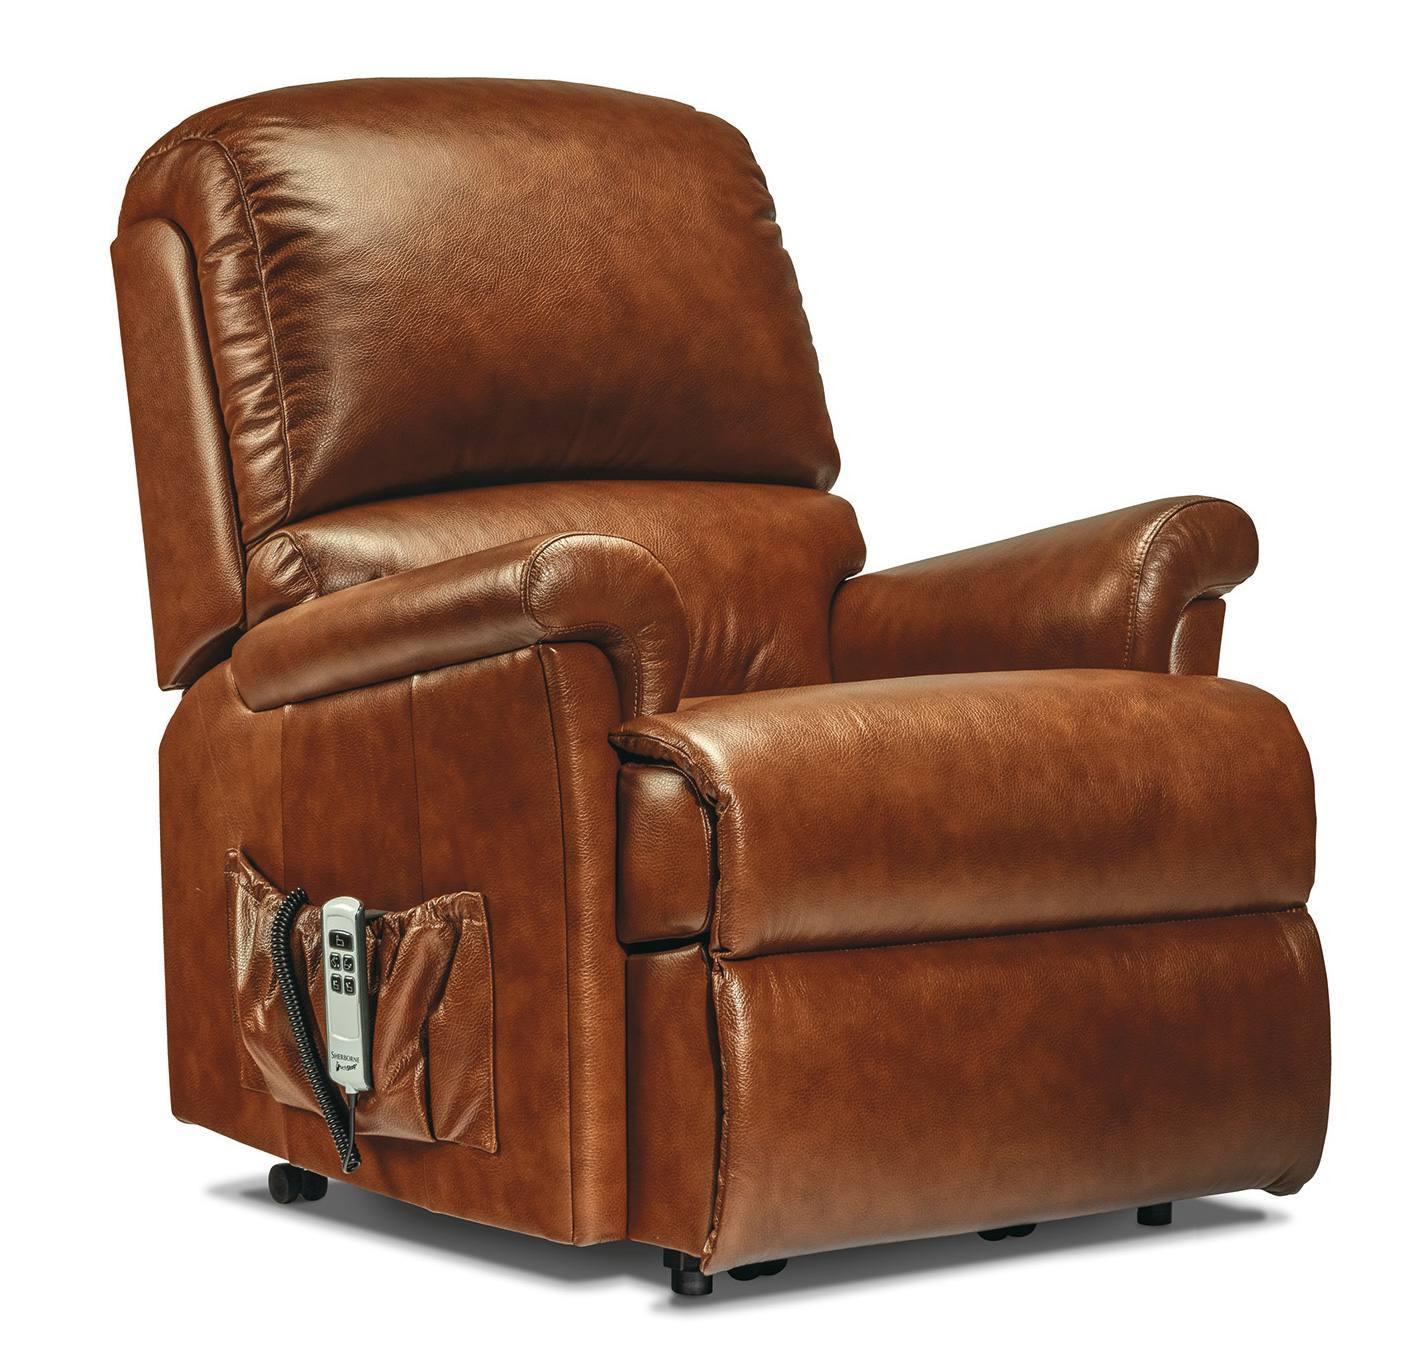 Sherborne Nevada Standard Electric Riser Recliner Chair